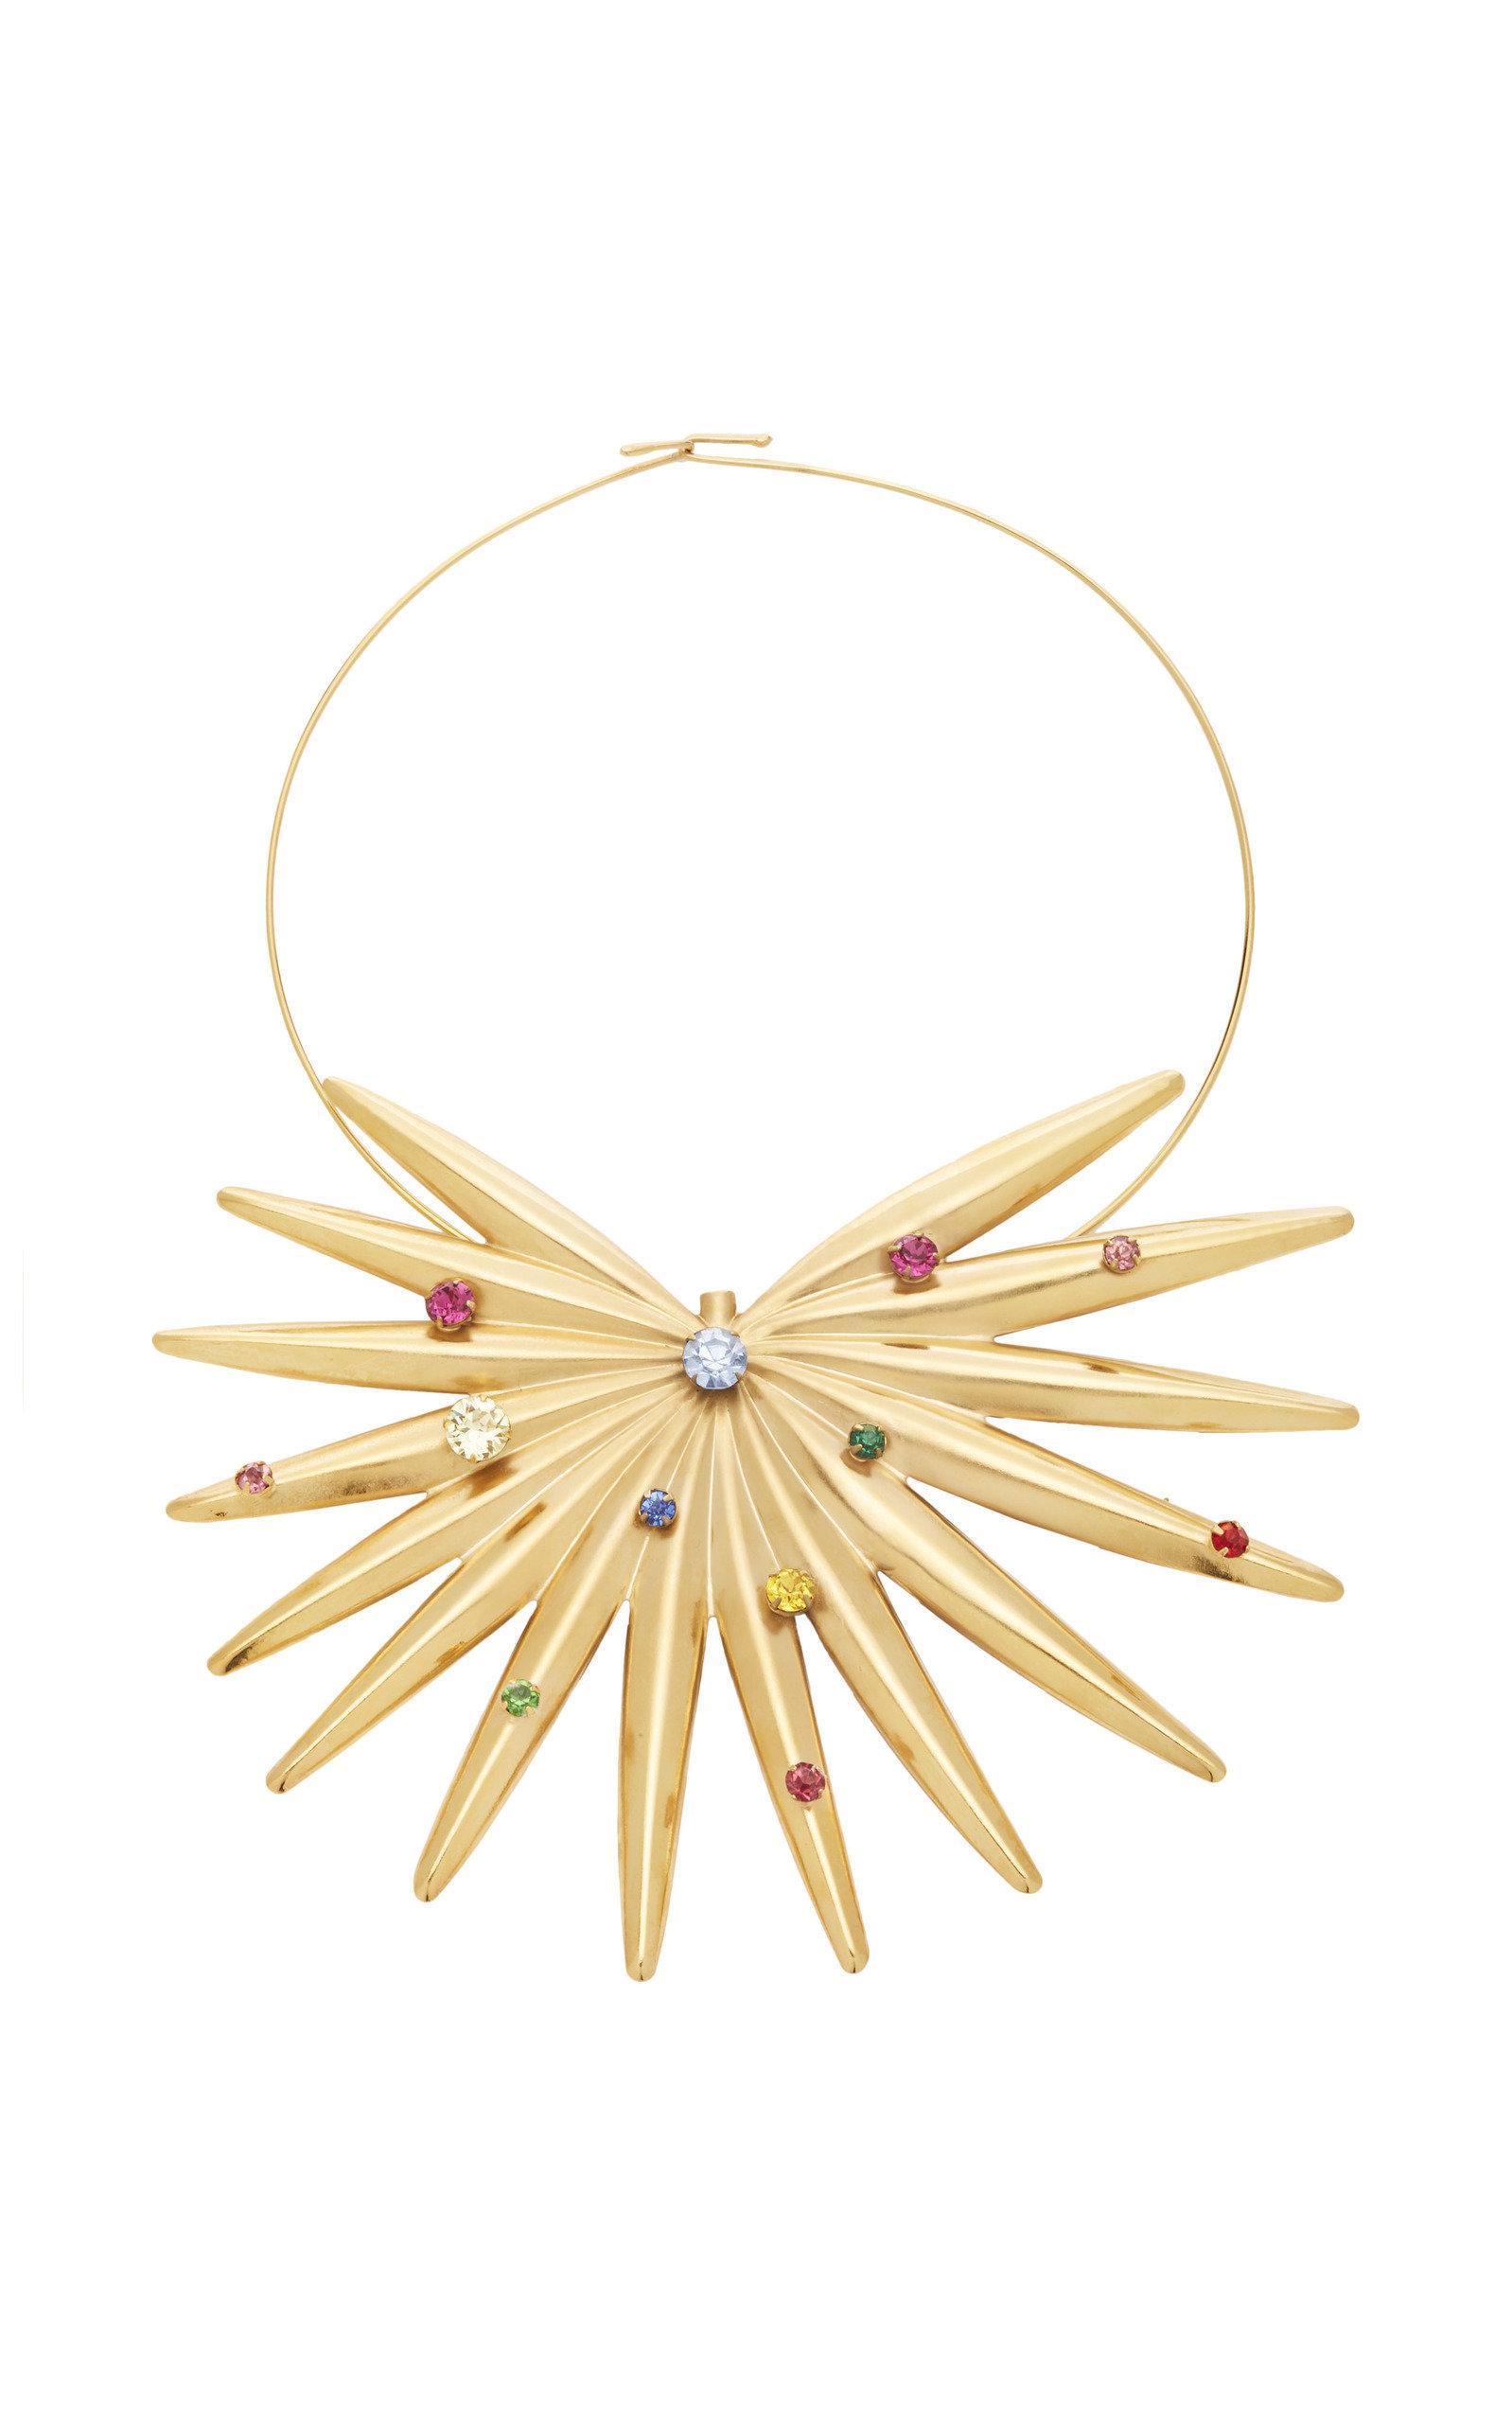 Rodarte Gold Palm Neclace With Swarovski Crystals